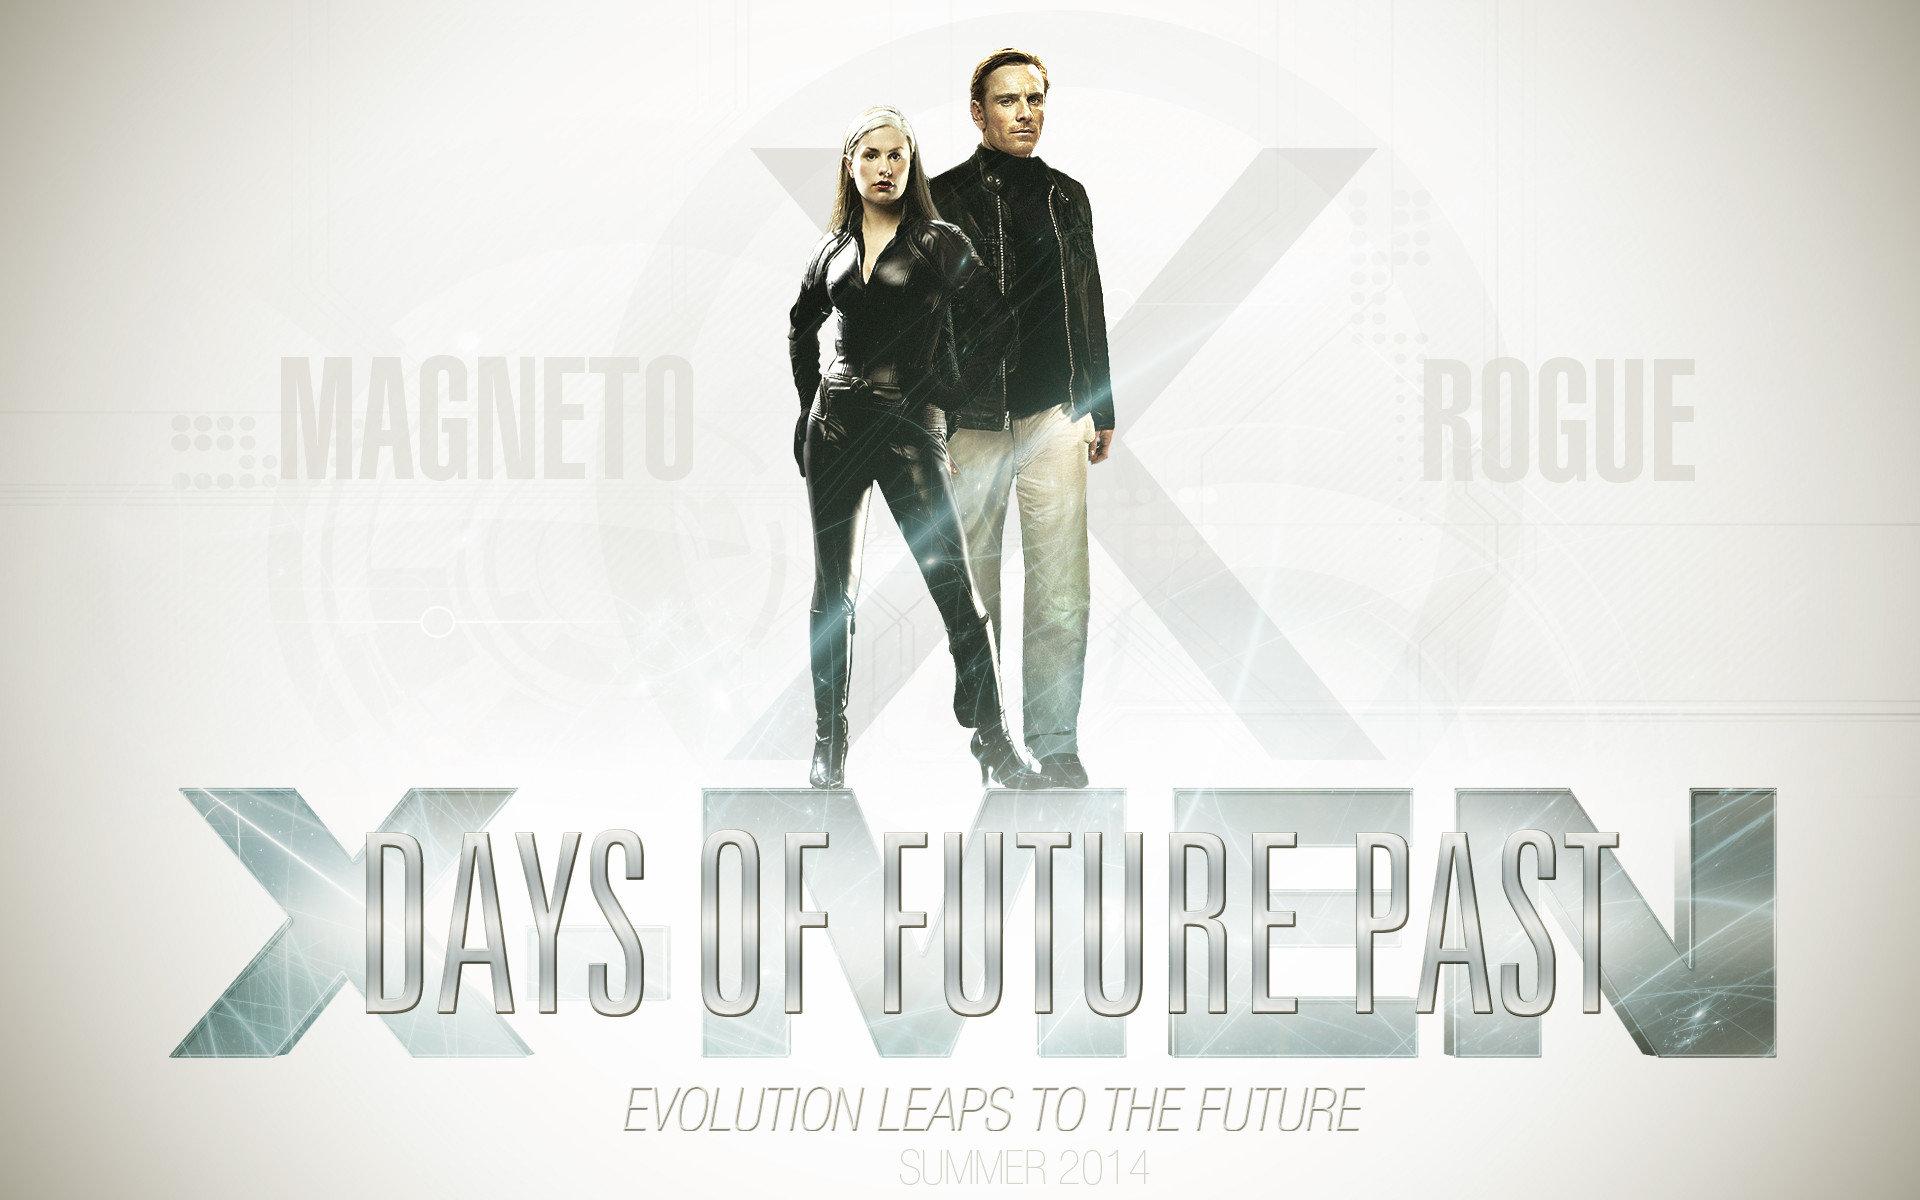 download hd 1920x1200 x-men: days of future past desktop wallpaper